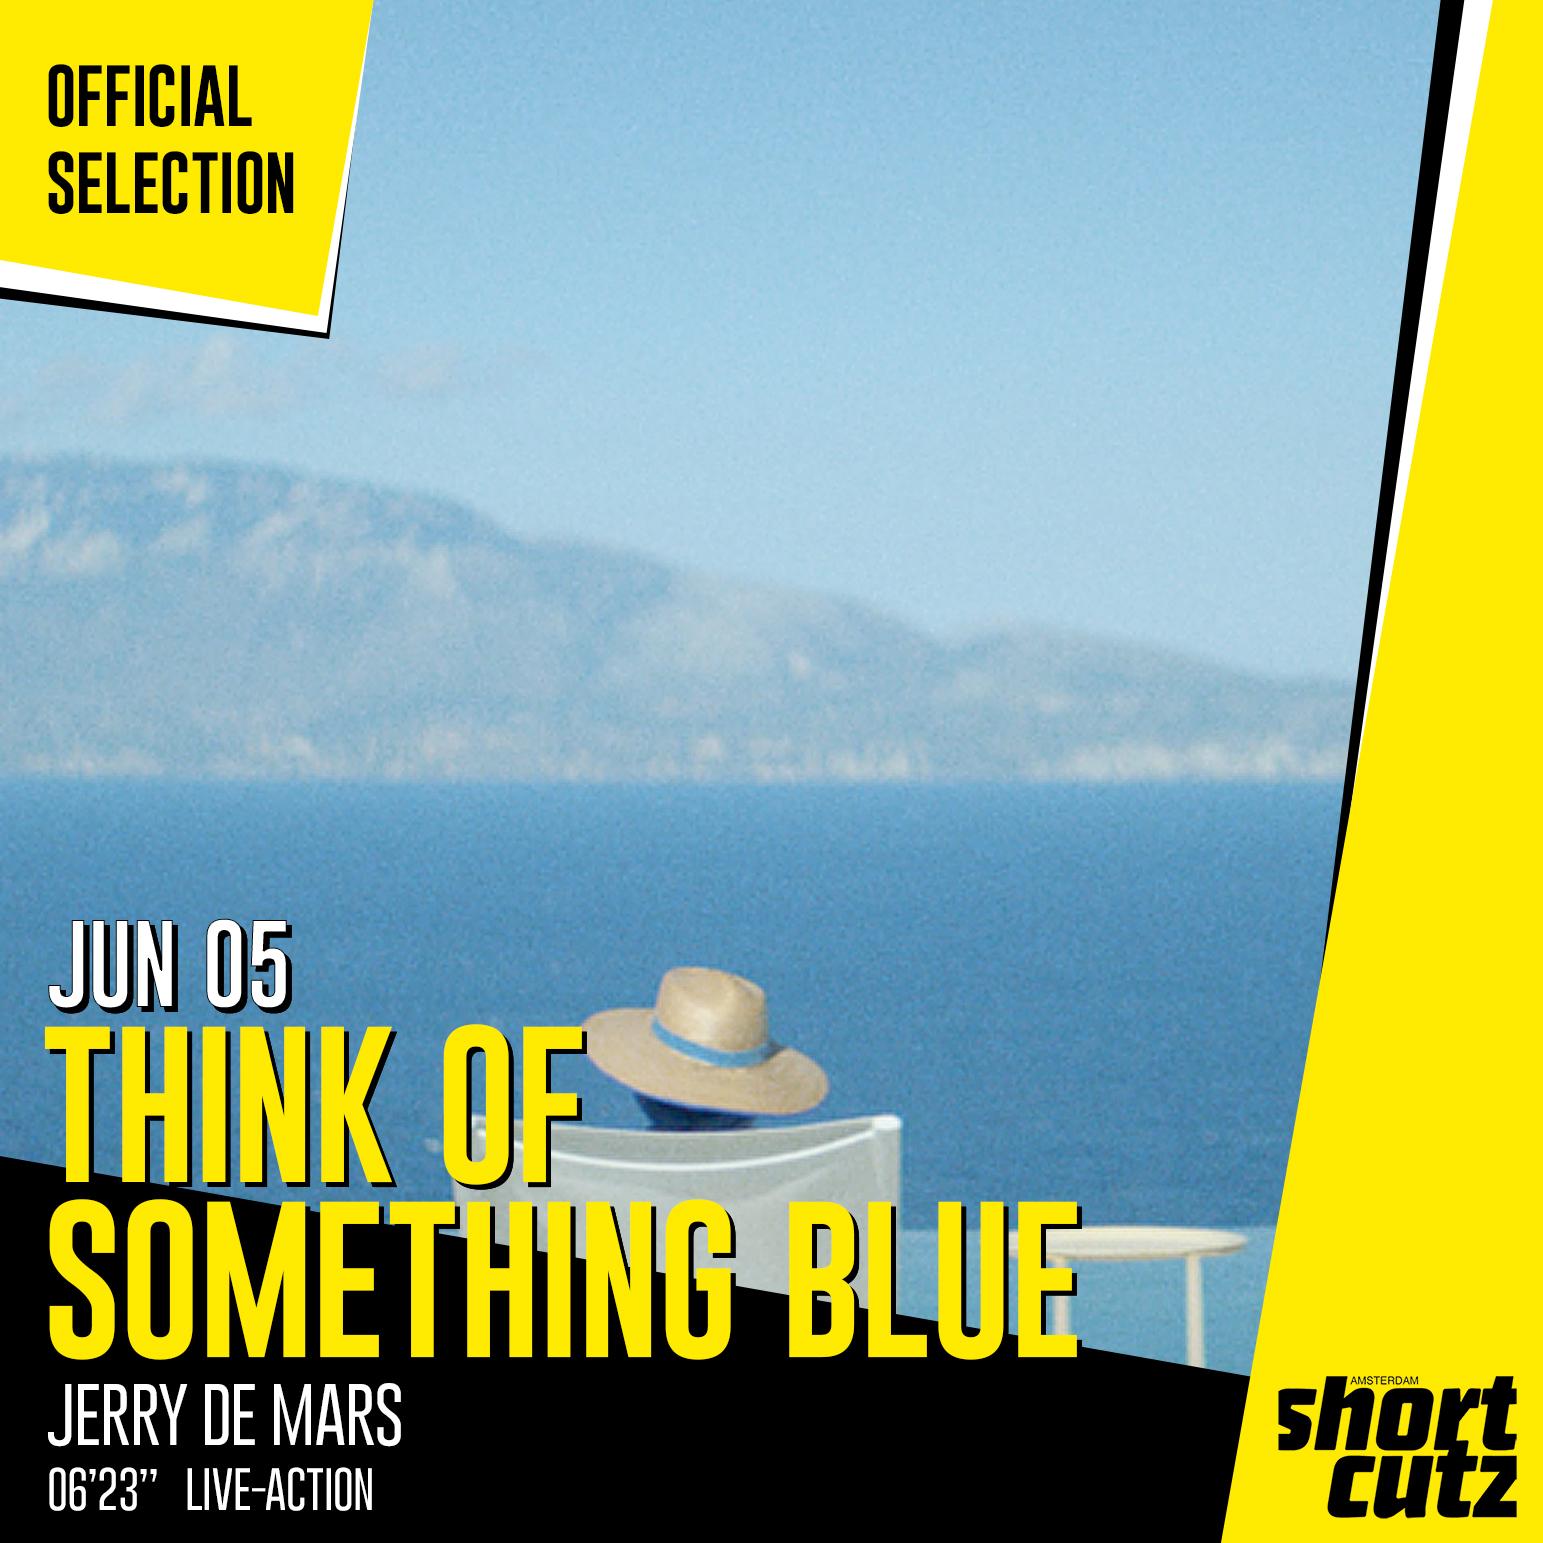 Think of something blue poster.jpg